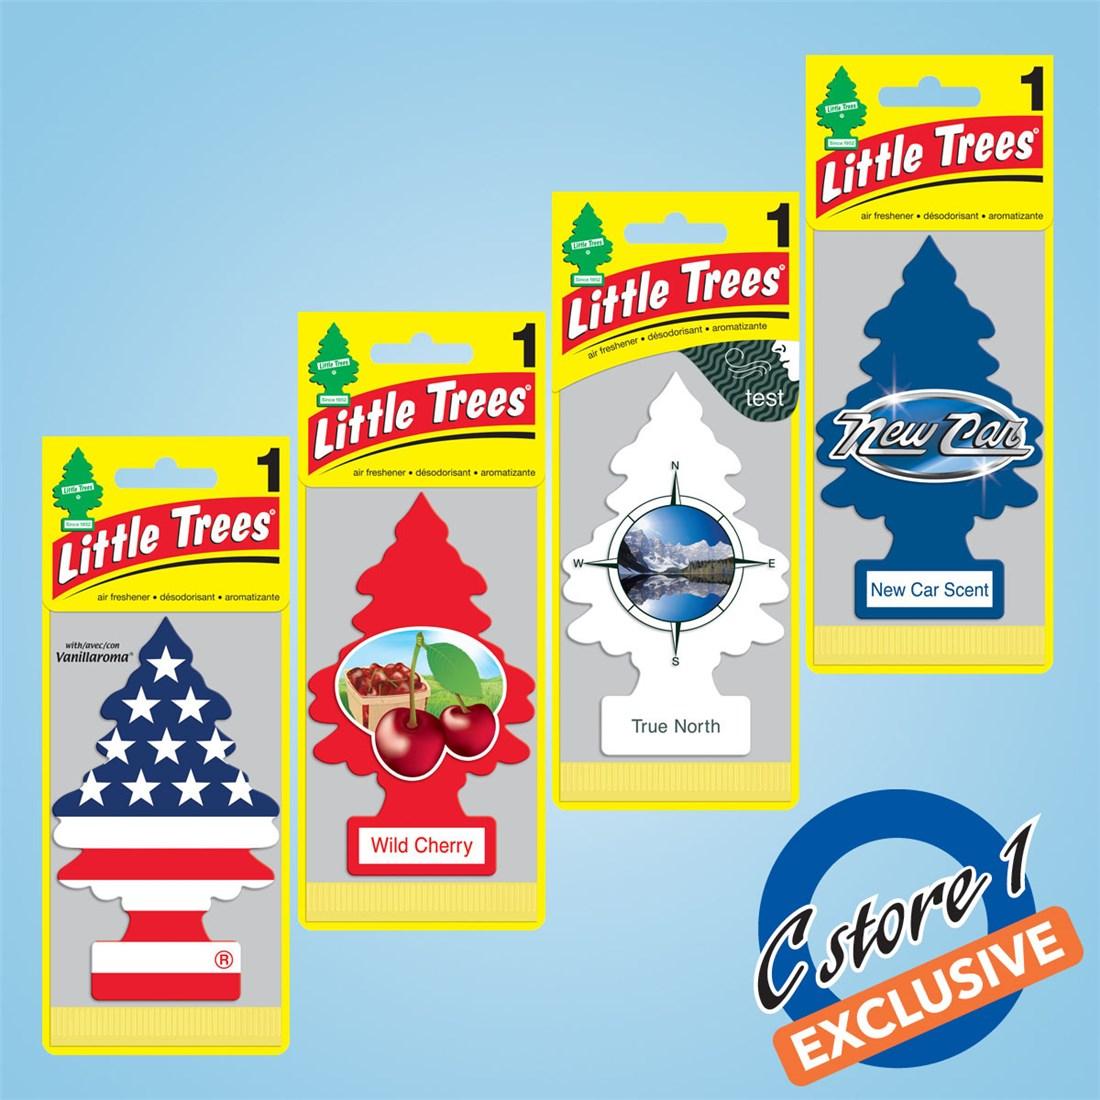 Little Trees Air Freshener Assortment Red White Blue Cstore1